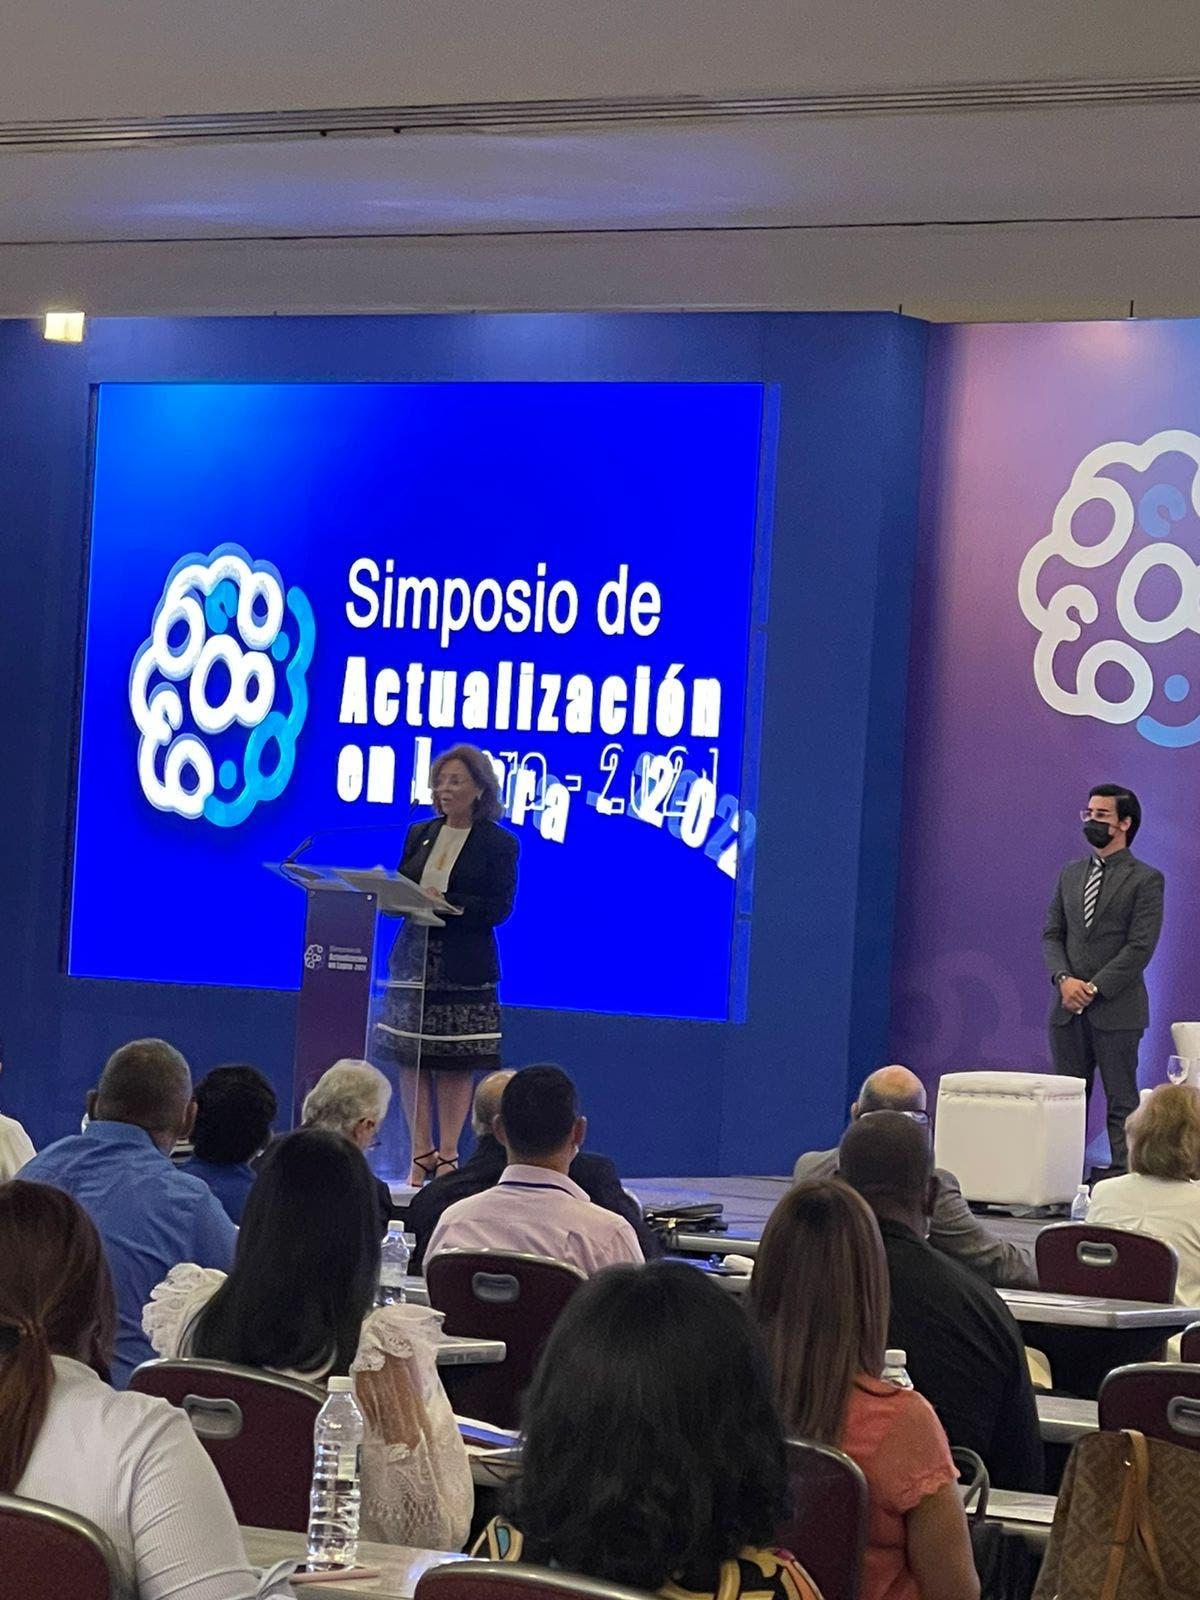 Instituto Dermatológico Dominicano y Patronato de Lucha Contra la Leprarealizan simposio